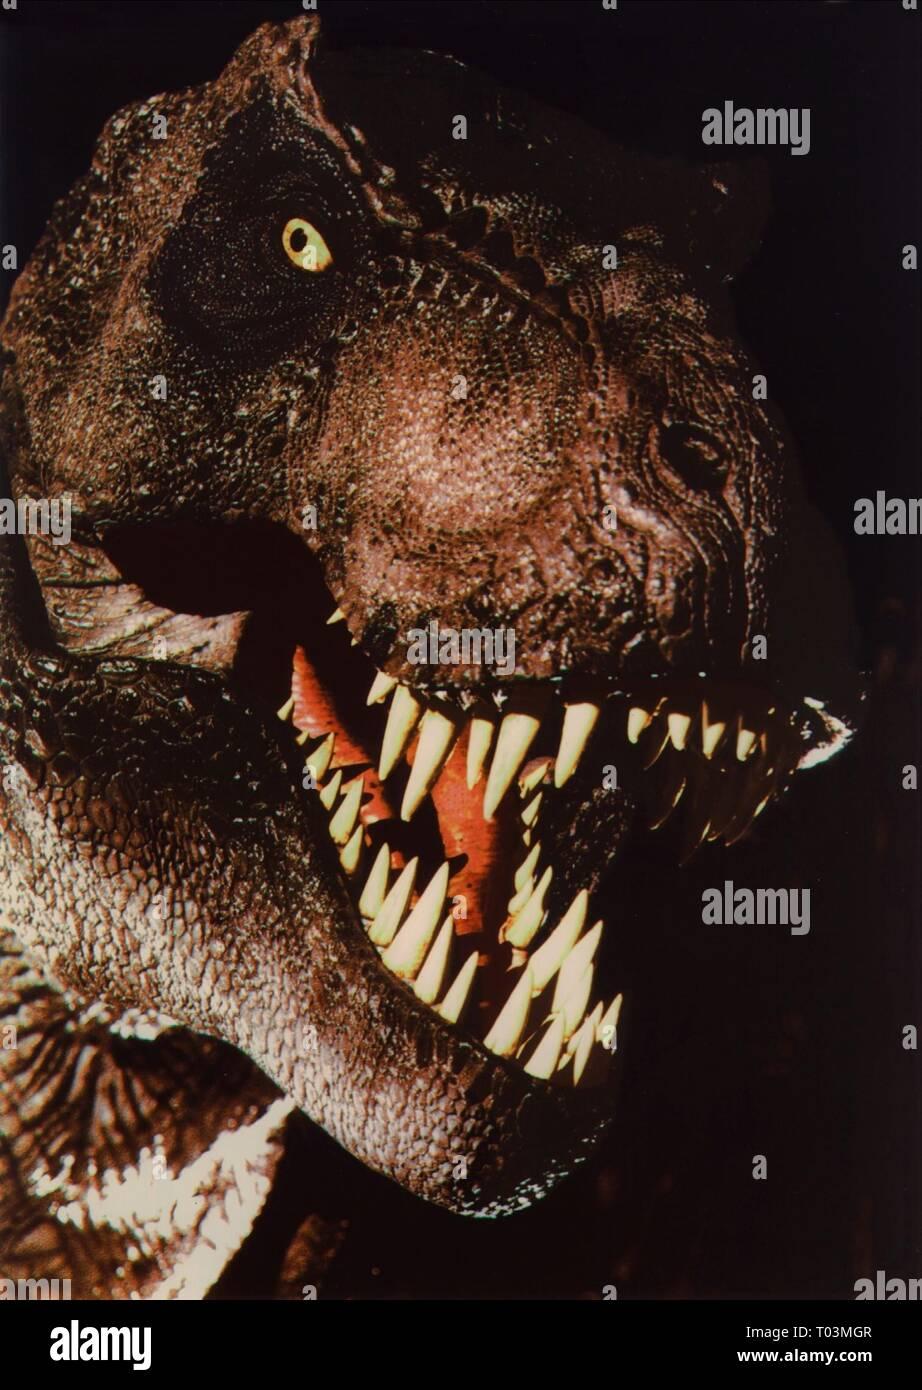 T-REX, JURASSIC PARK, 1993 - Stock Image